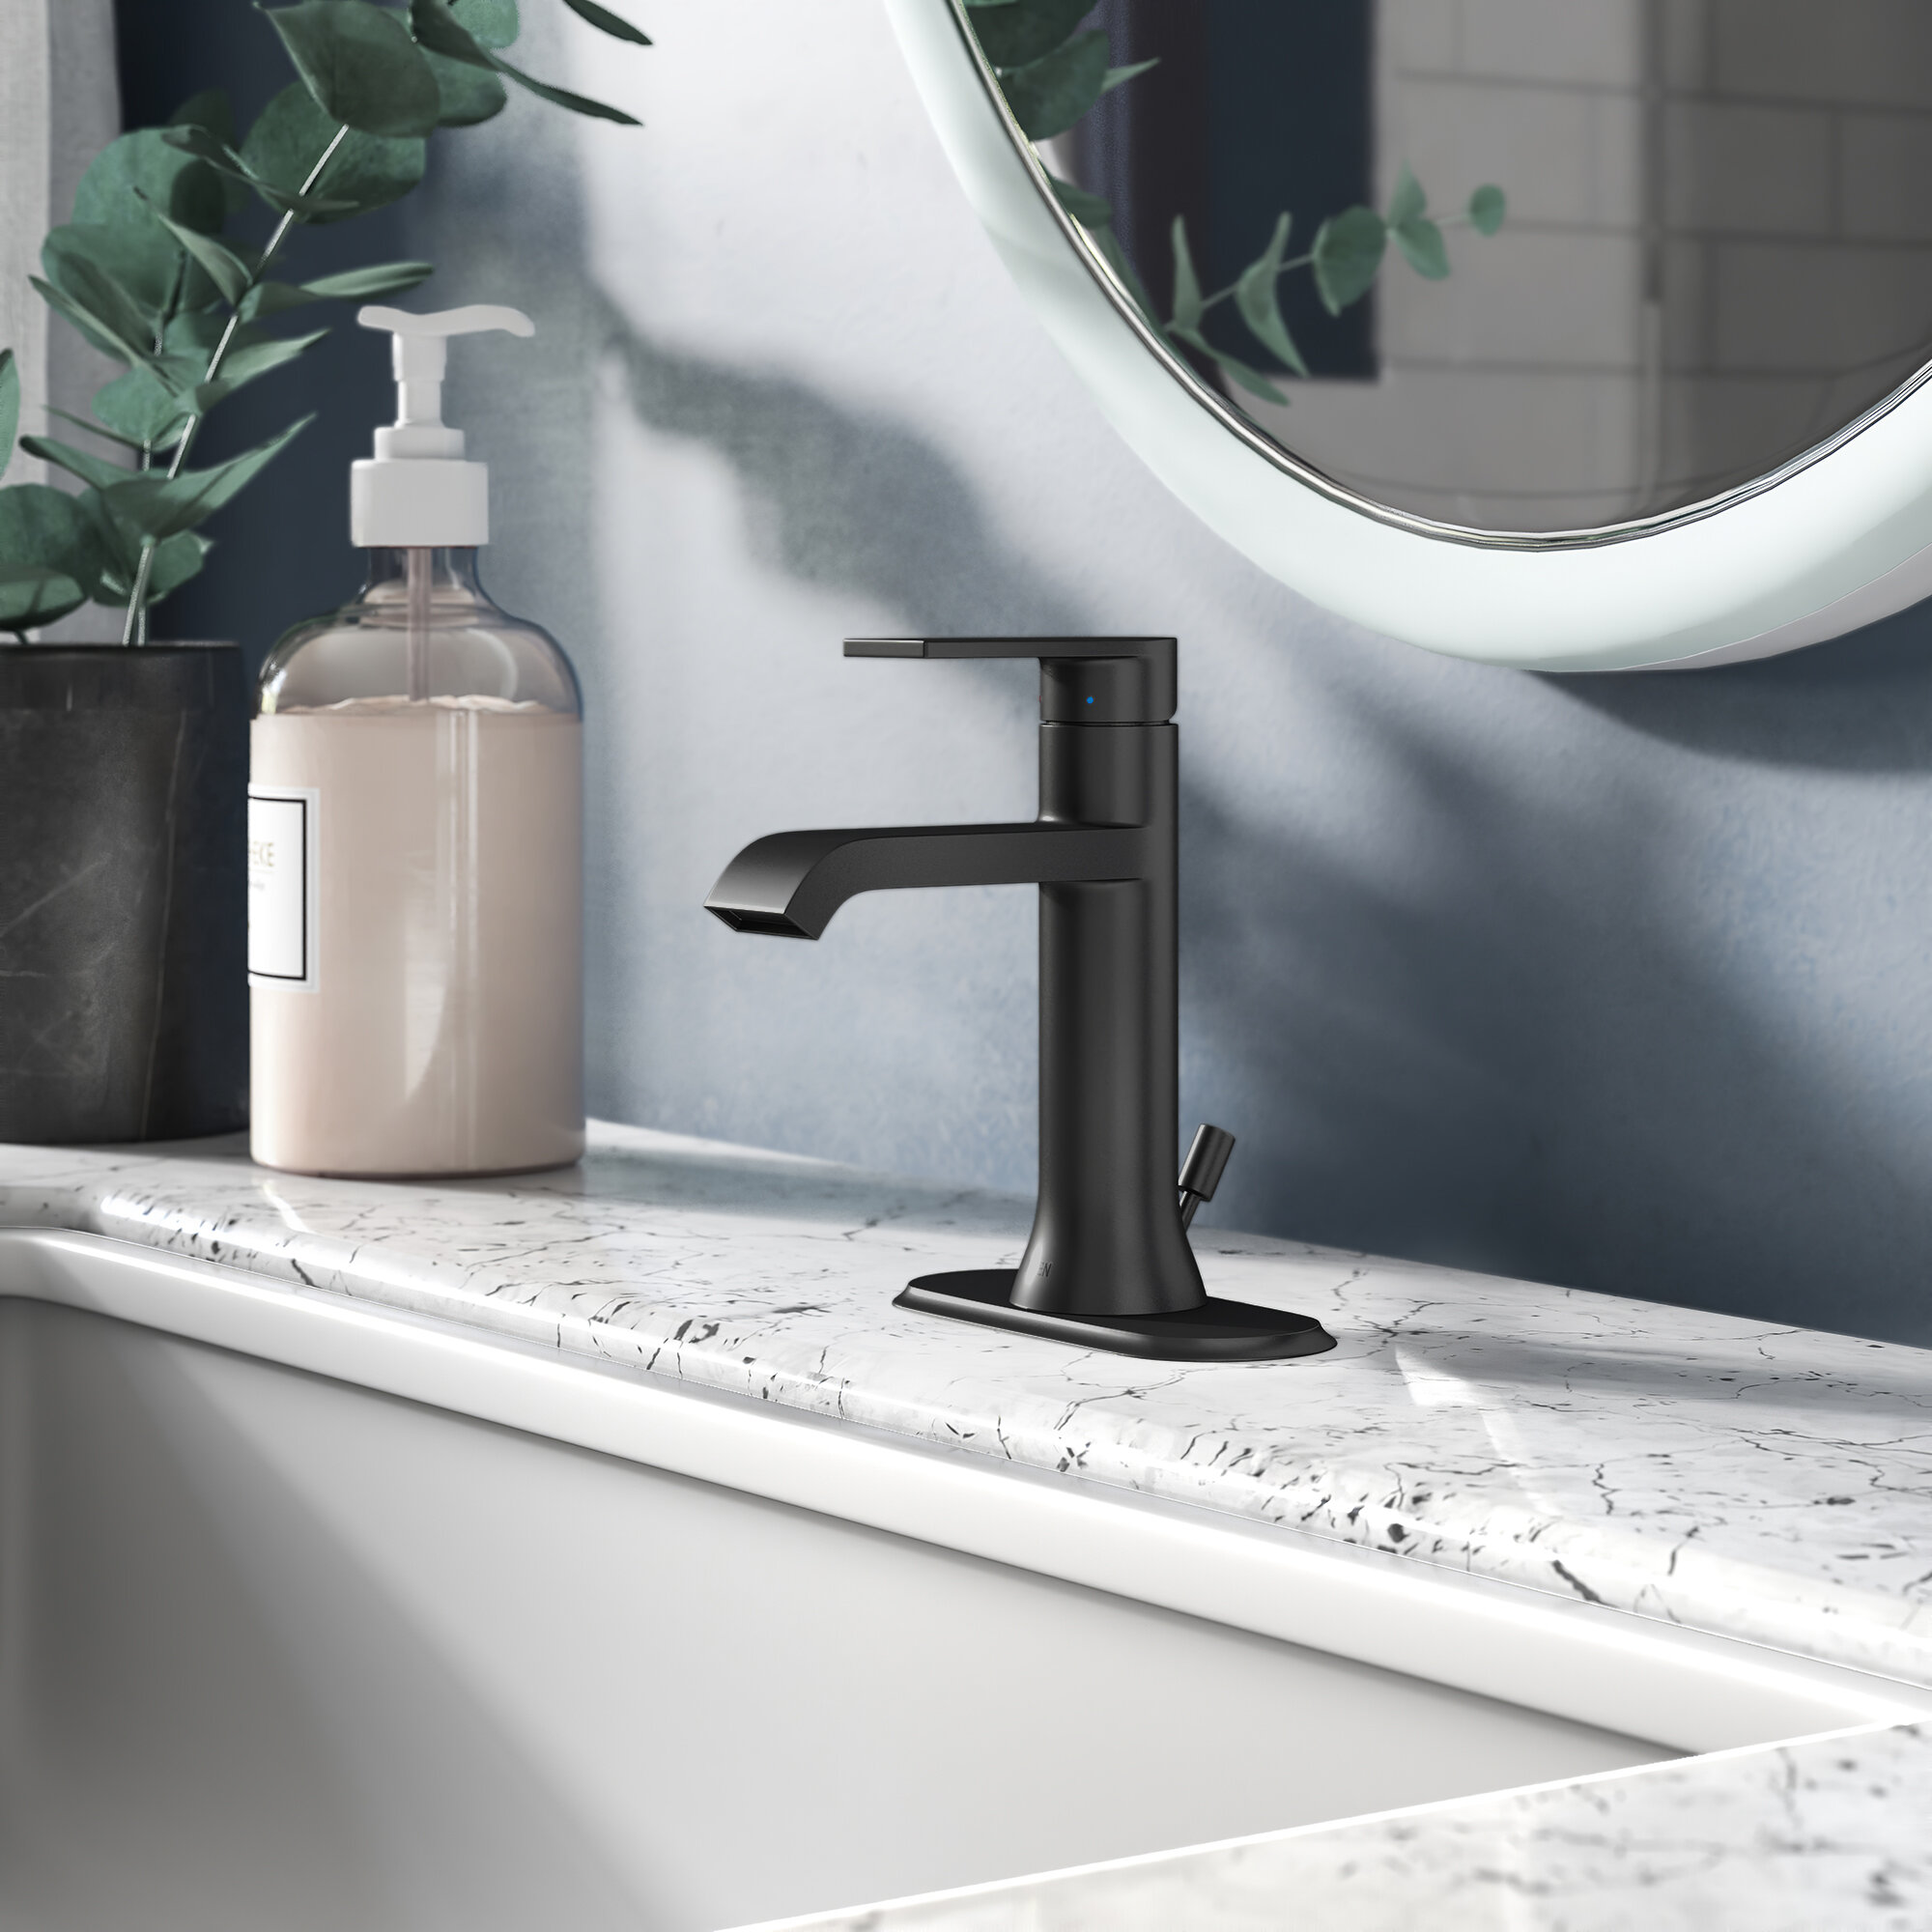 6702 Moen Genta Lx Single Hole Bathroom Faucet With Drain Assembly Reviews Wayfair